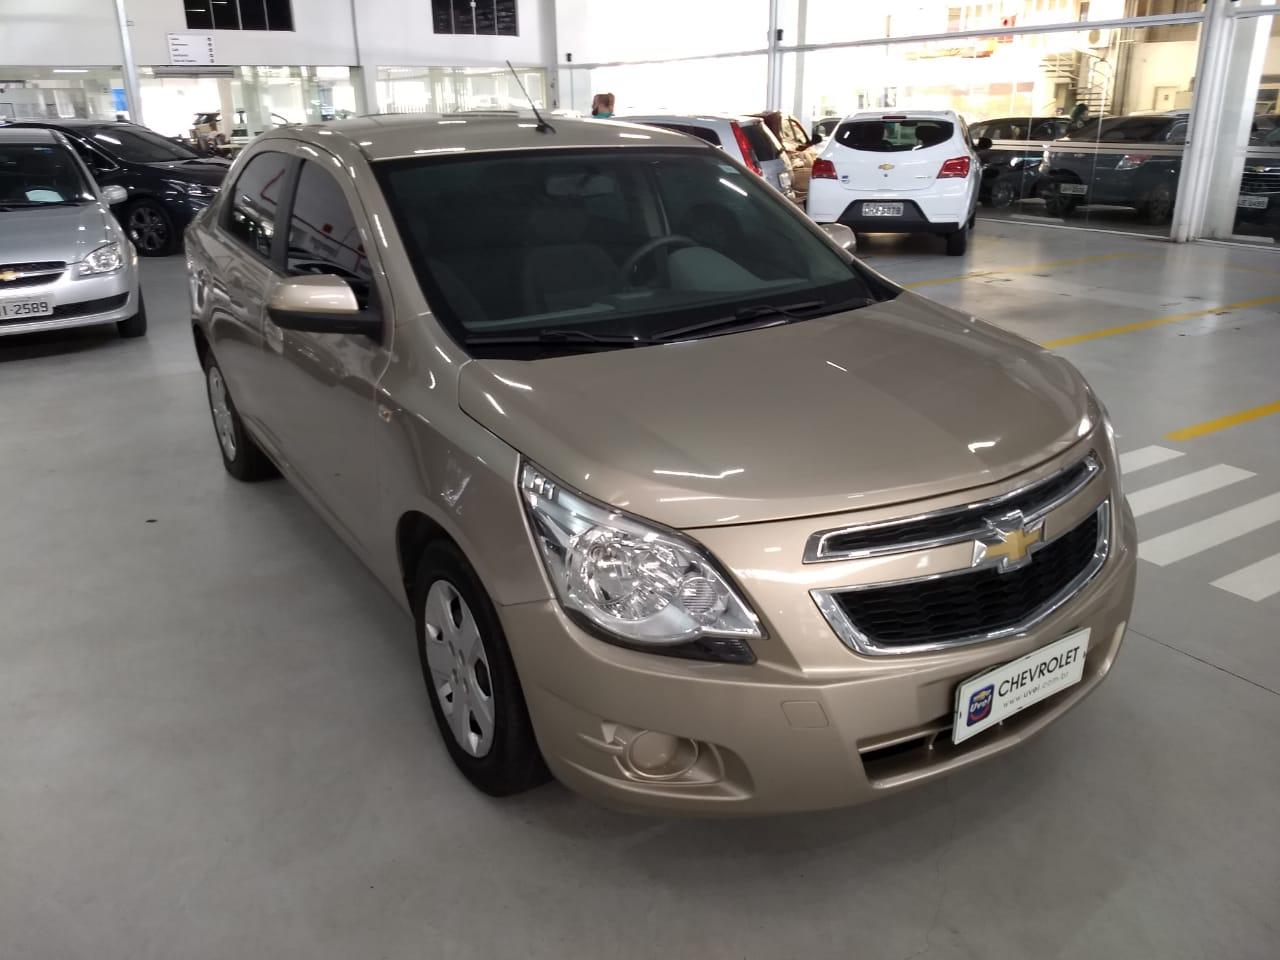 Chevrolet Cobalt LT 1.4L 2014